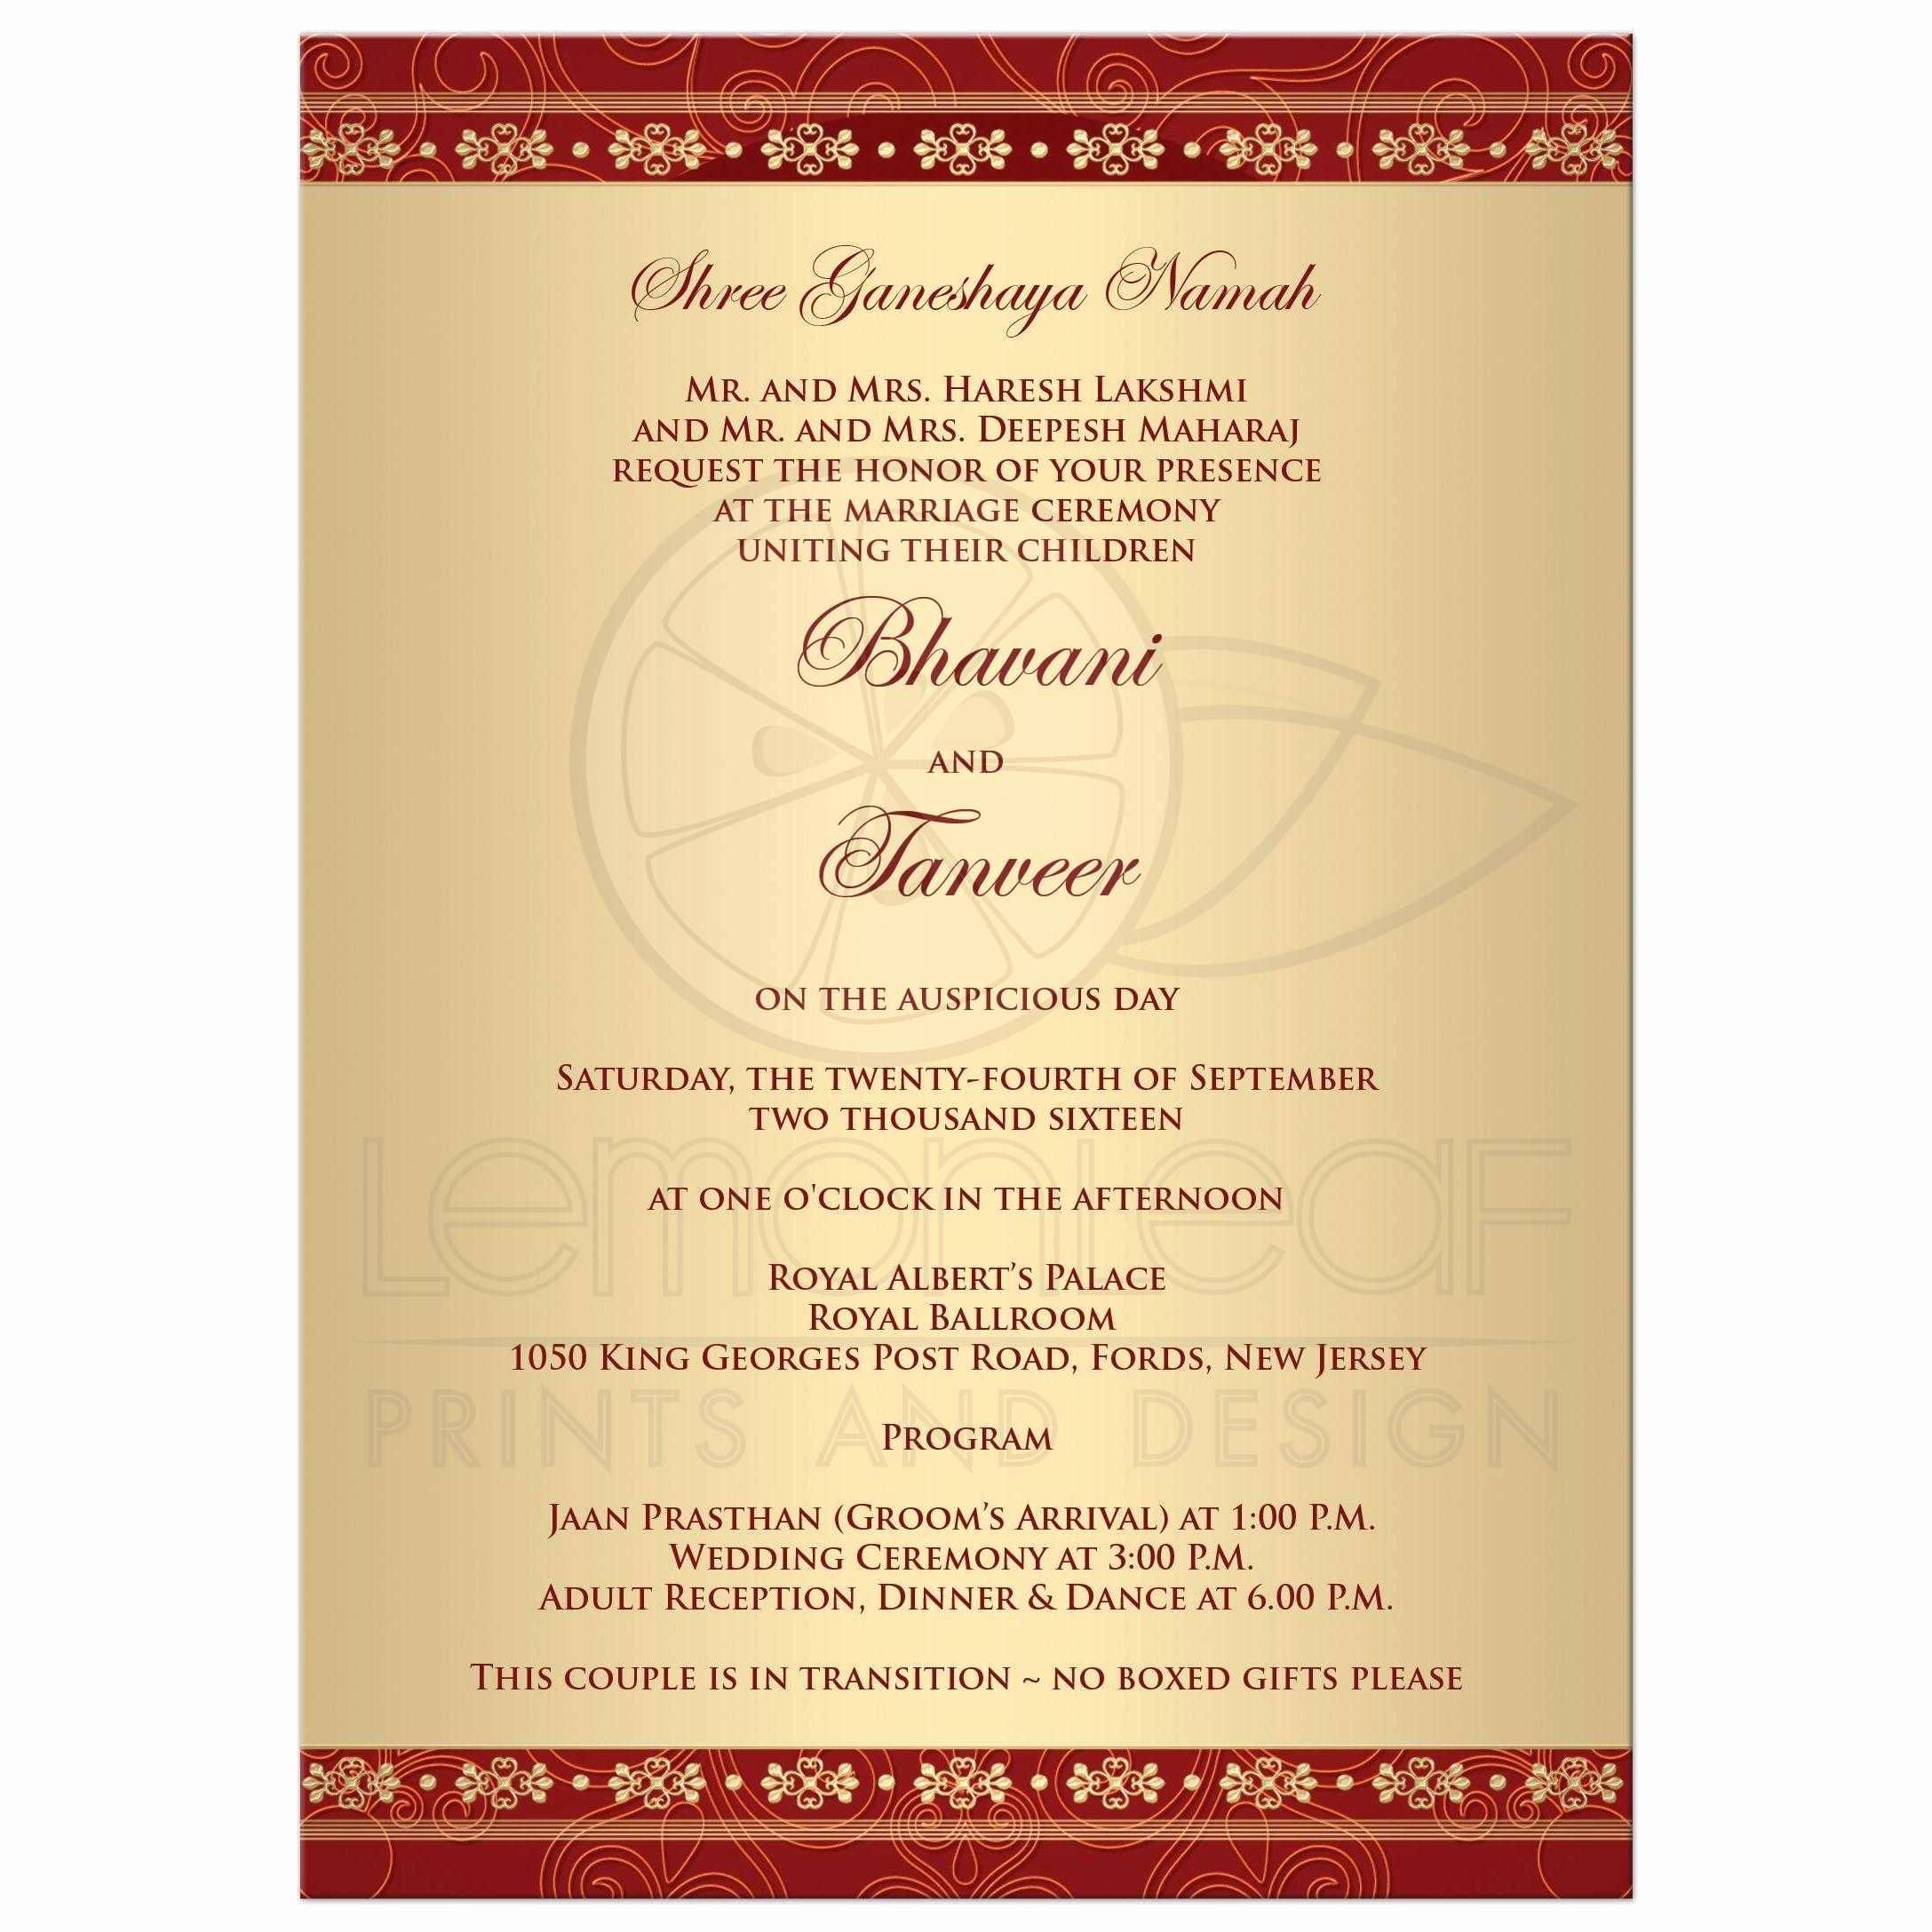 Wedding Invitation Details Card Wording Luxury Wedding Invitation Creative Wedding Invitation Wording